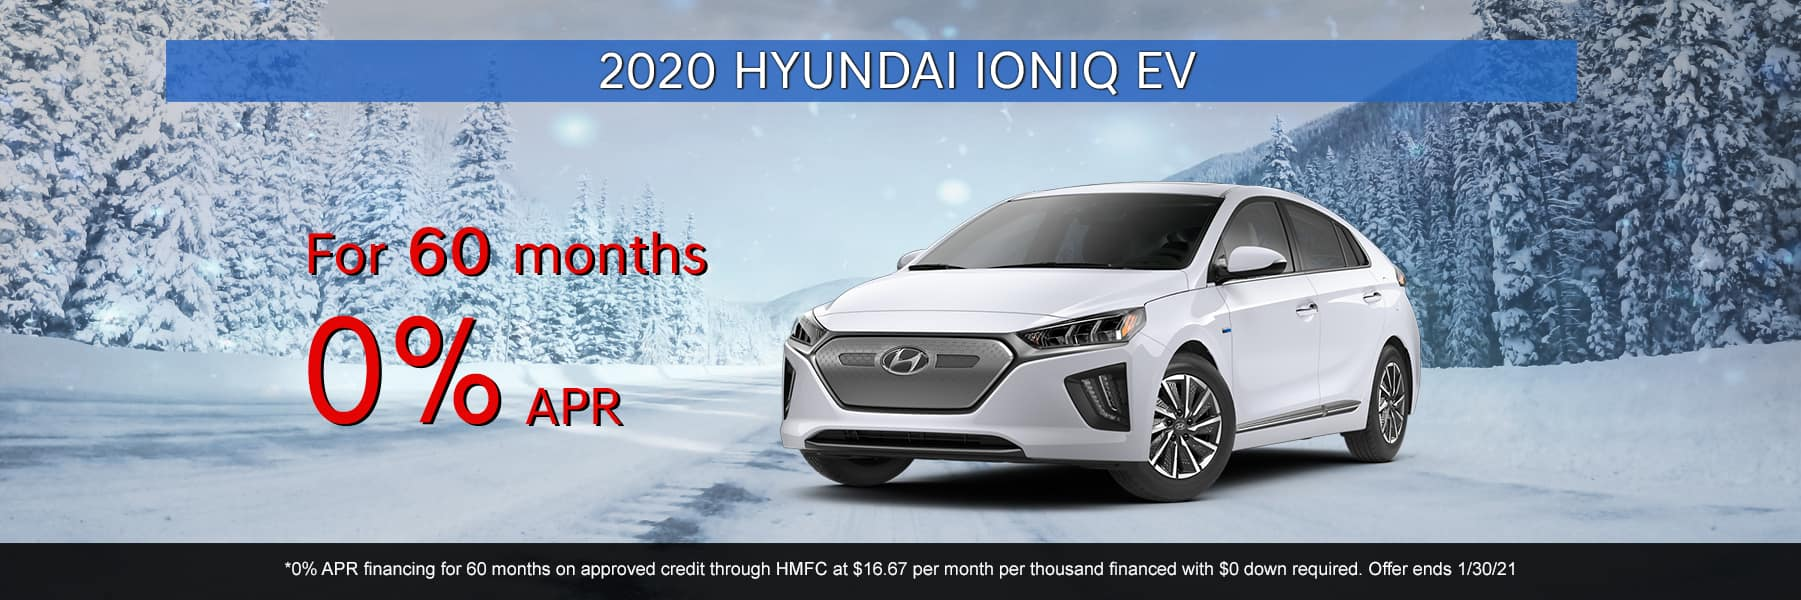 2020-Hyundai-Ioniq-EV-Jan21